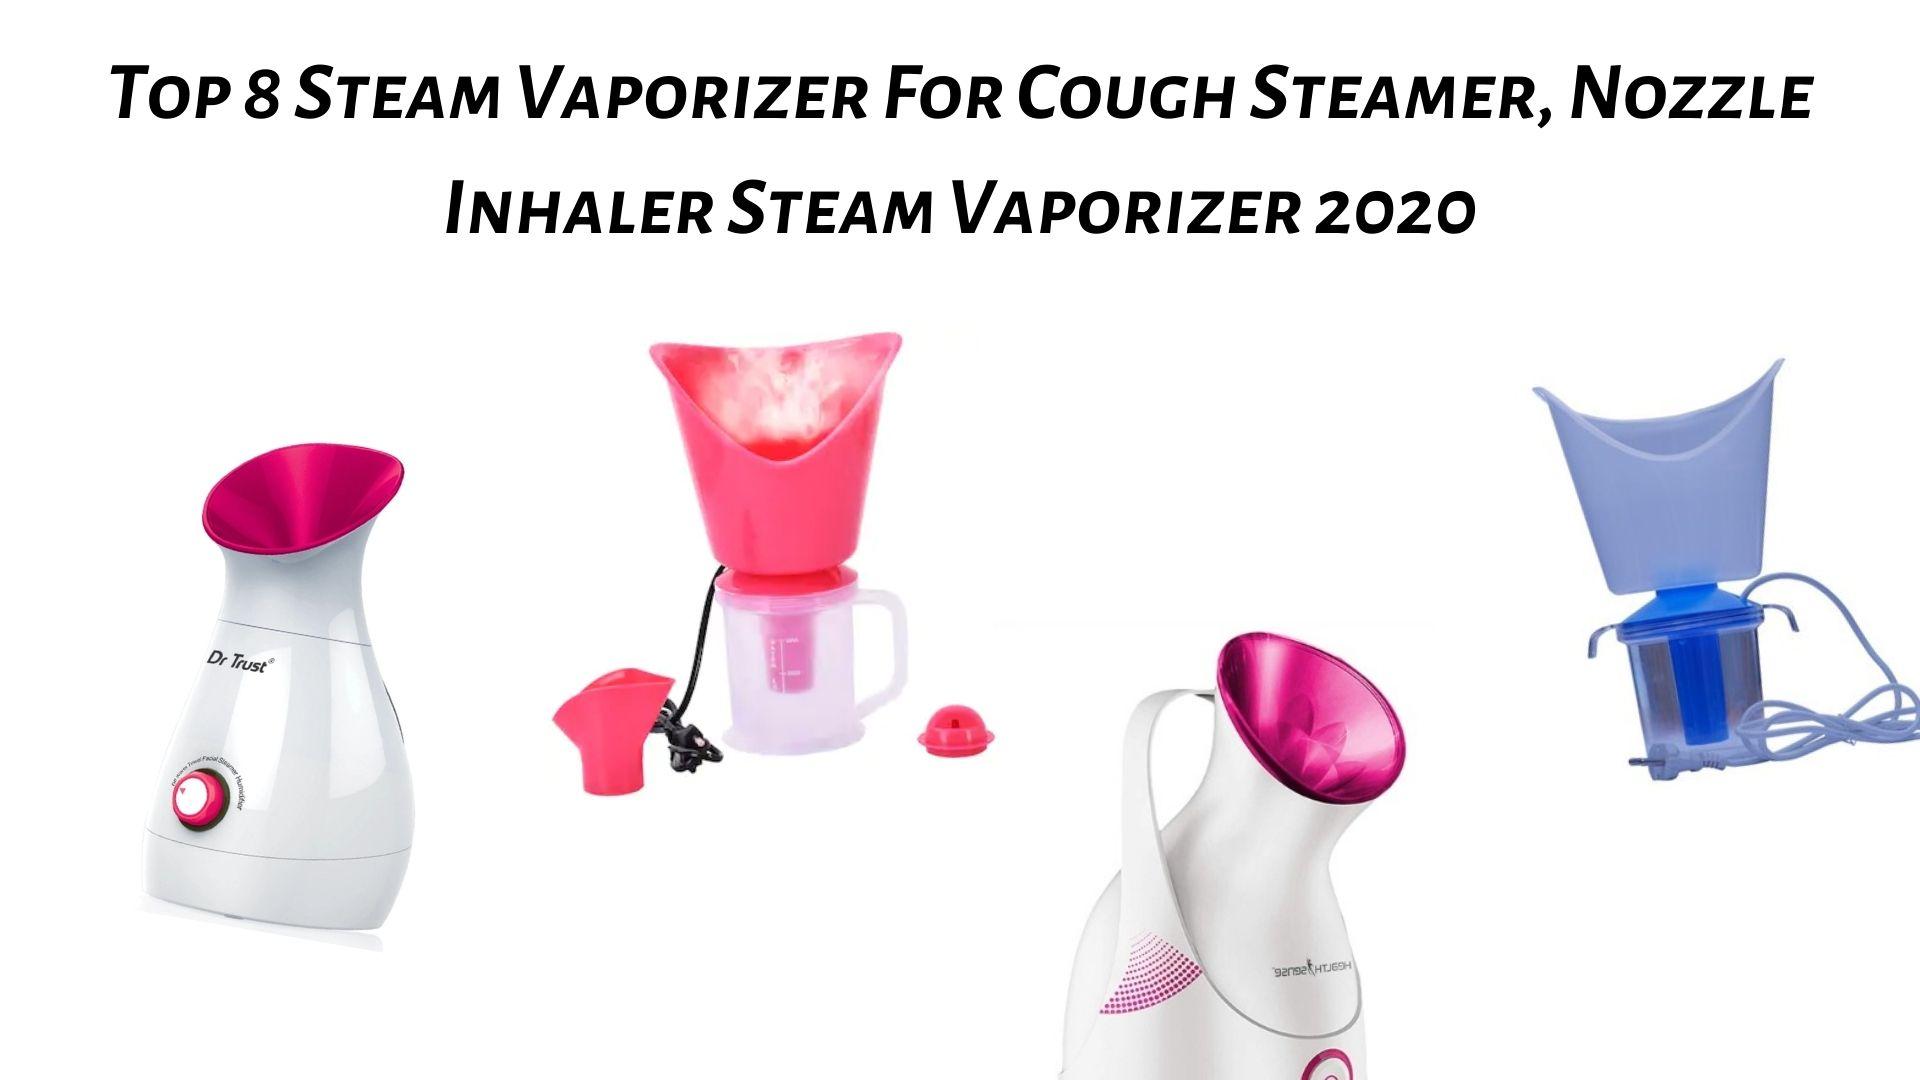 Top 8 Steam Vaporizer For Cough Steamer, Nozzle Inhaler Steam Vaporizer 2020